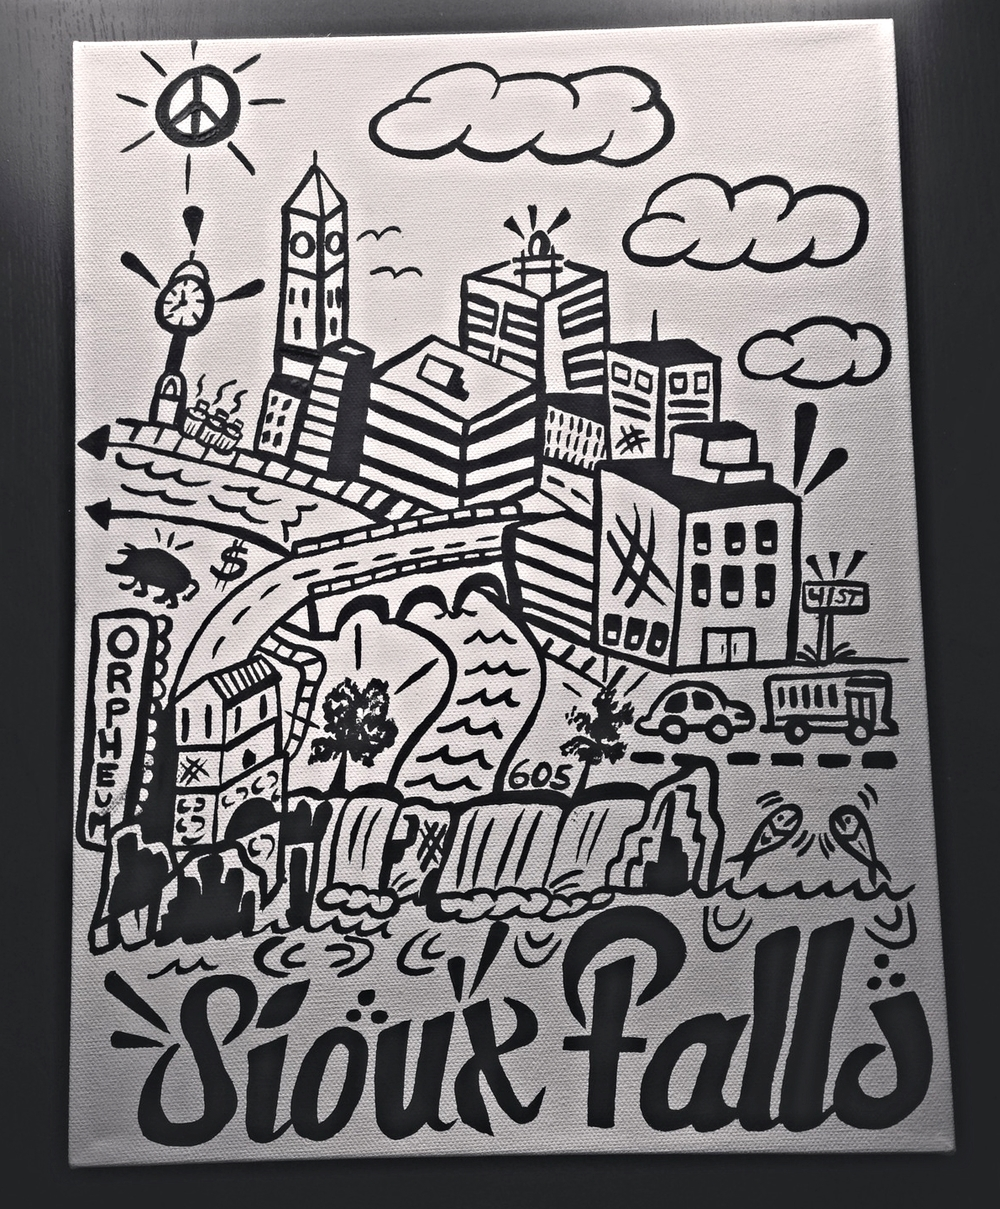 Sioux Falls Simplified Understanding